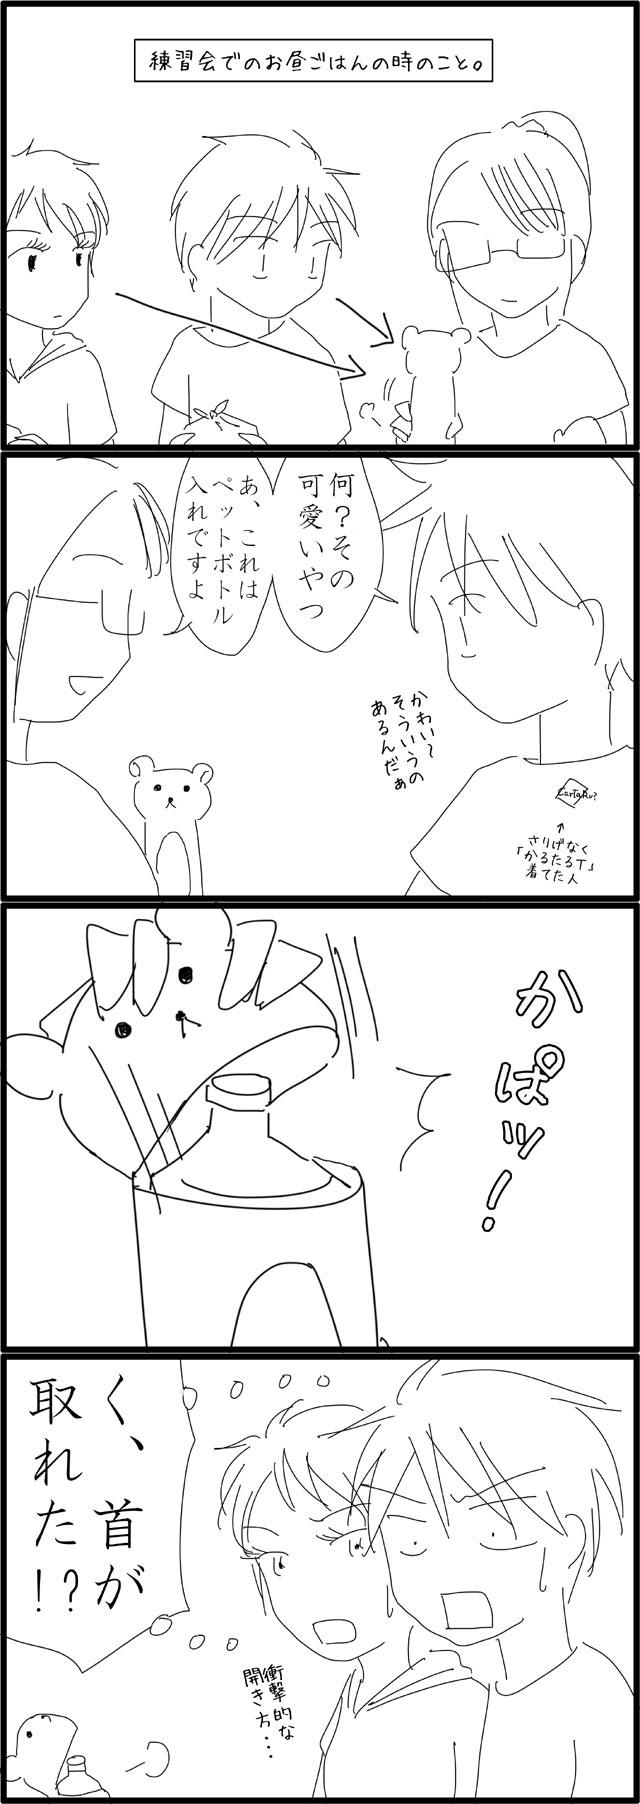 f:id:karutaru:20120919073723j:image:w480